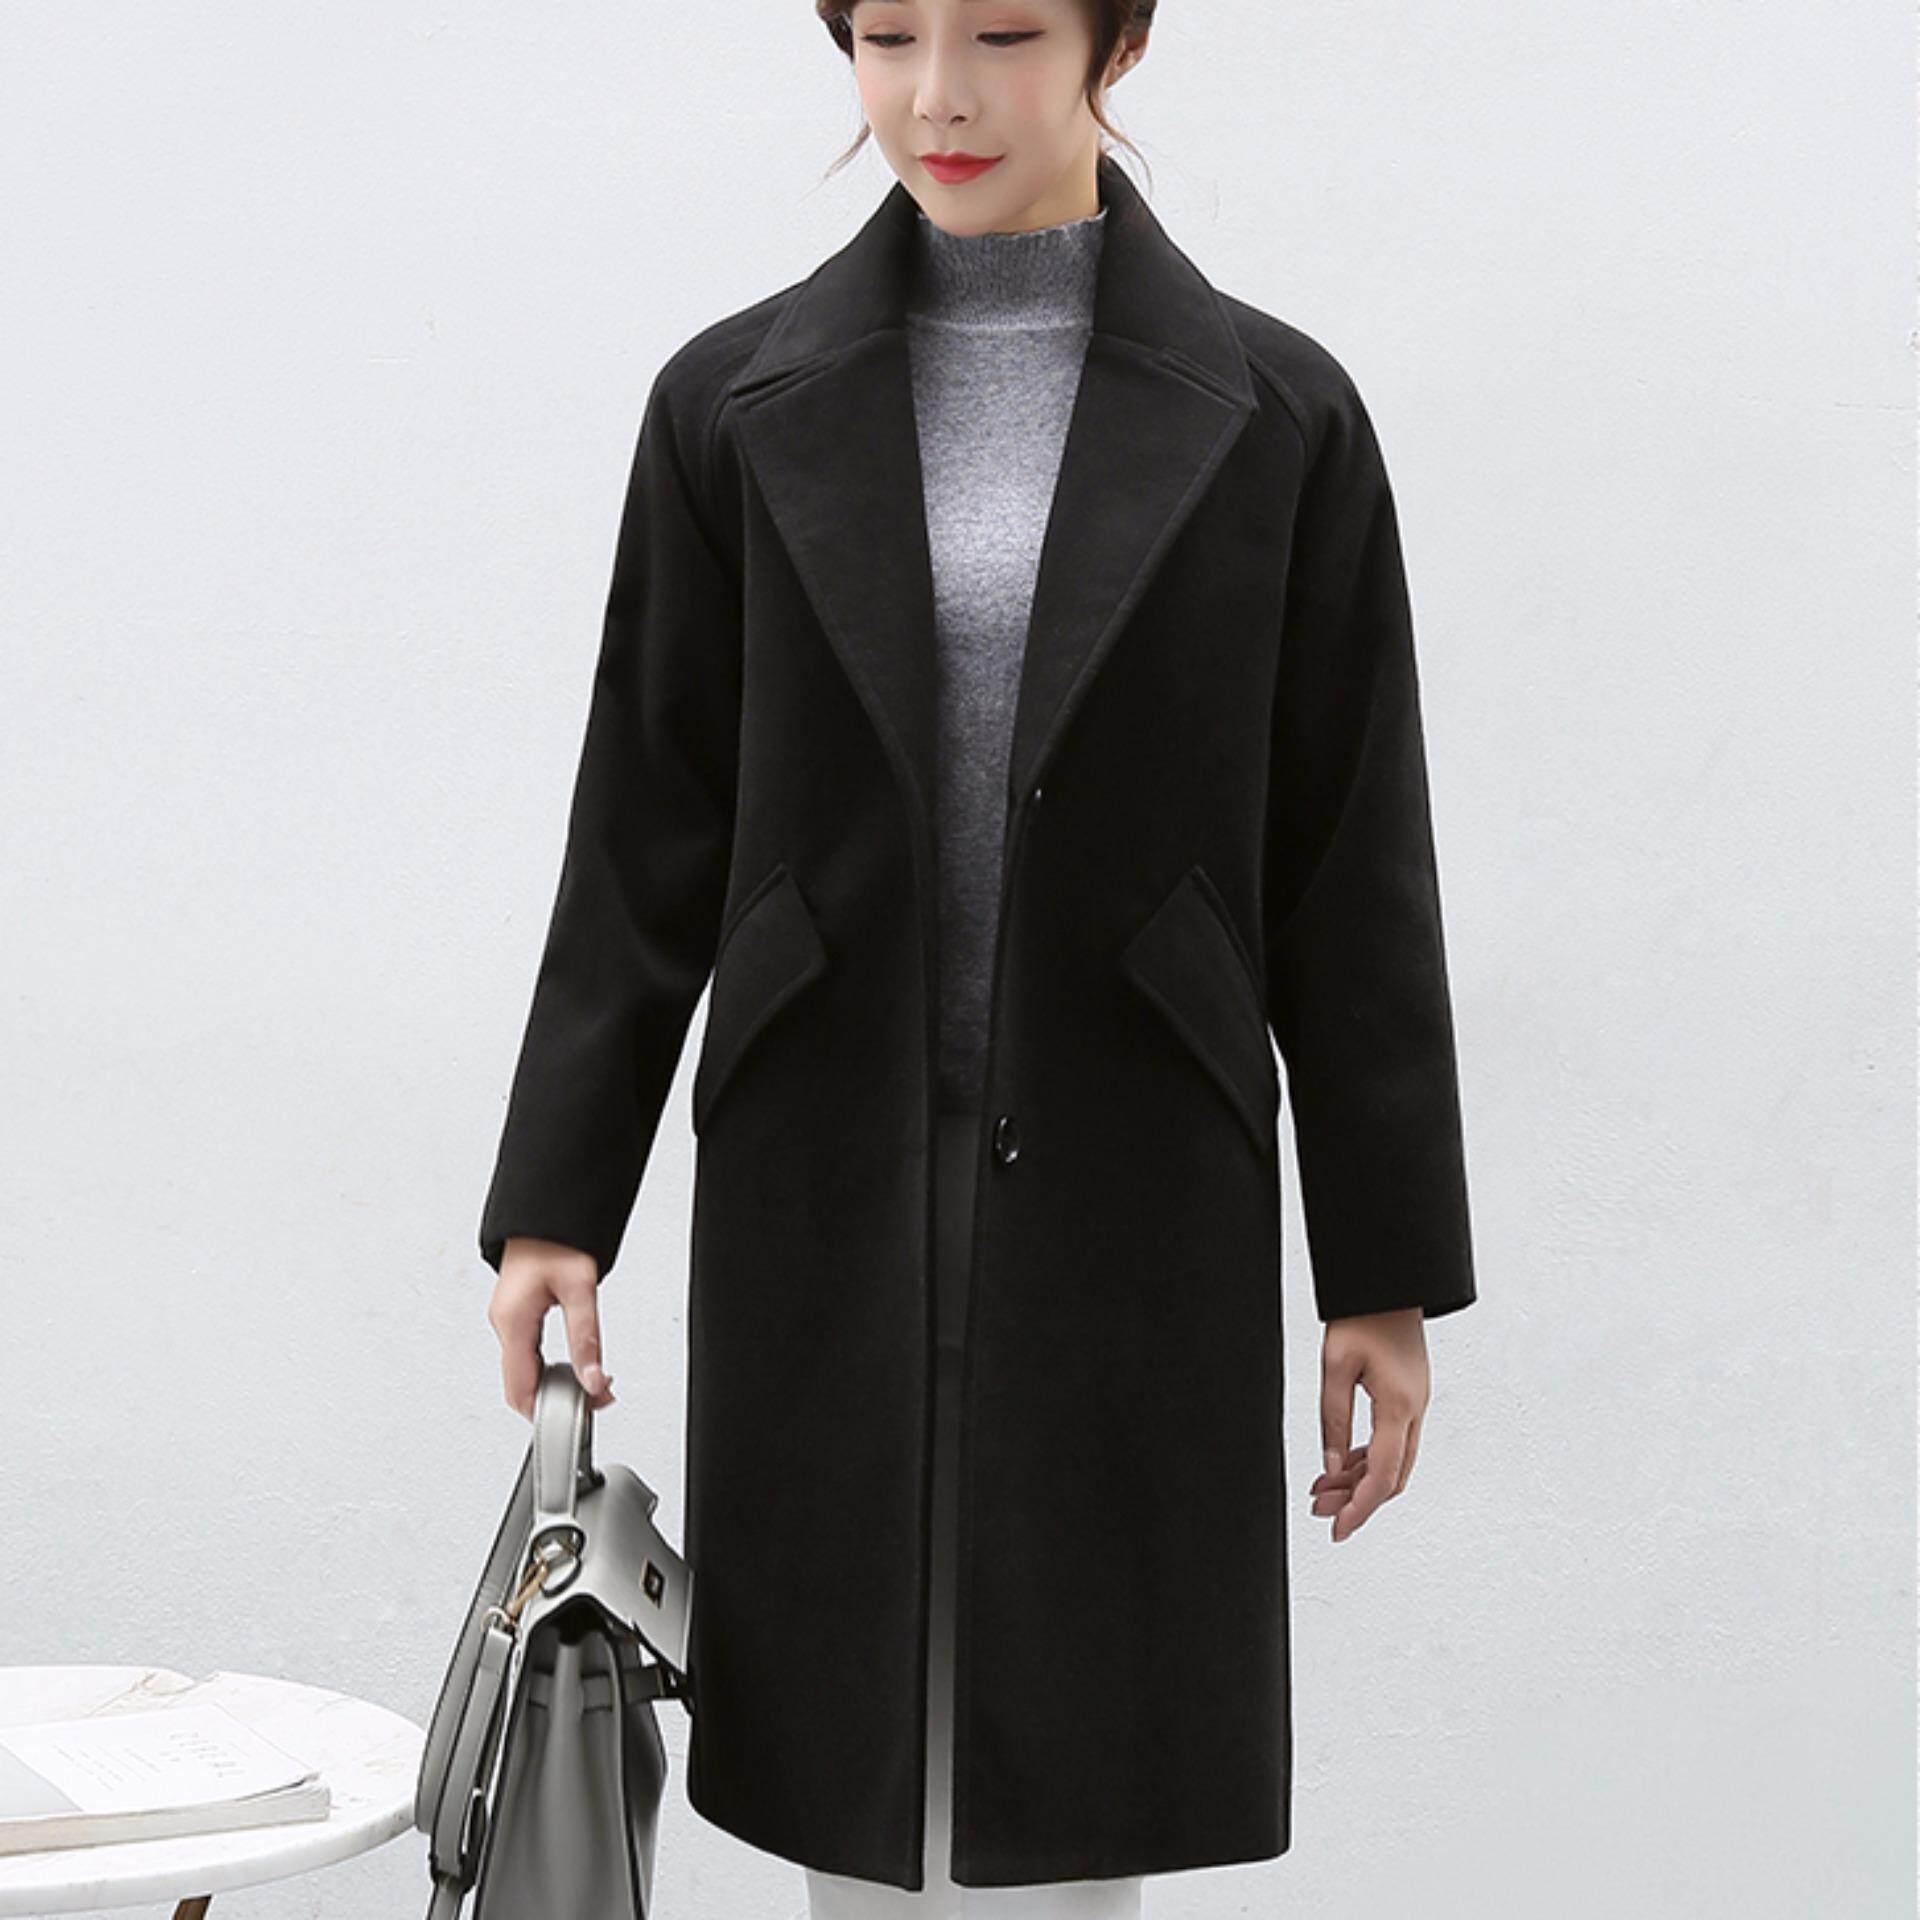 ... Aquinn Labelle Blazer Long Sleeve Squall Hitam Cream Daftar Harga Source JYS Fashion Korean Style